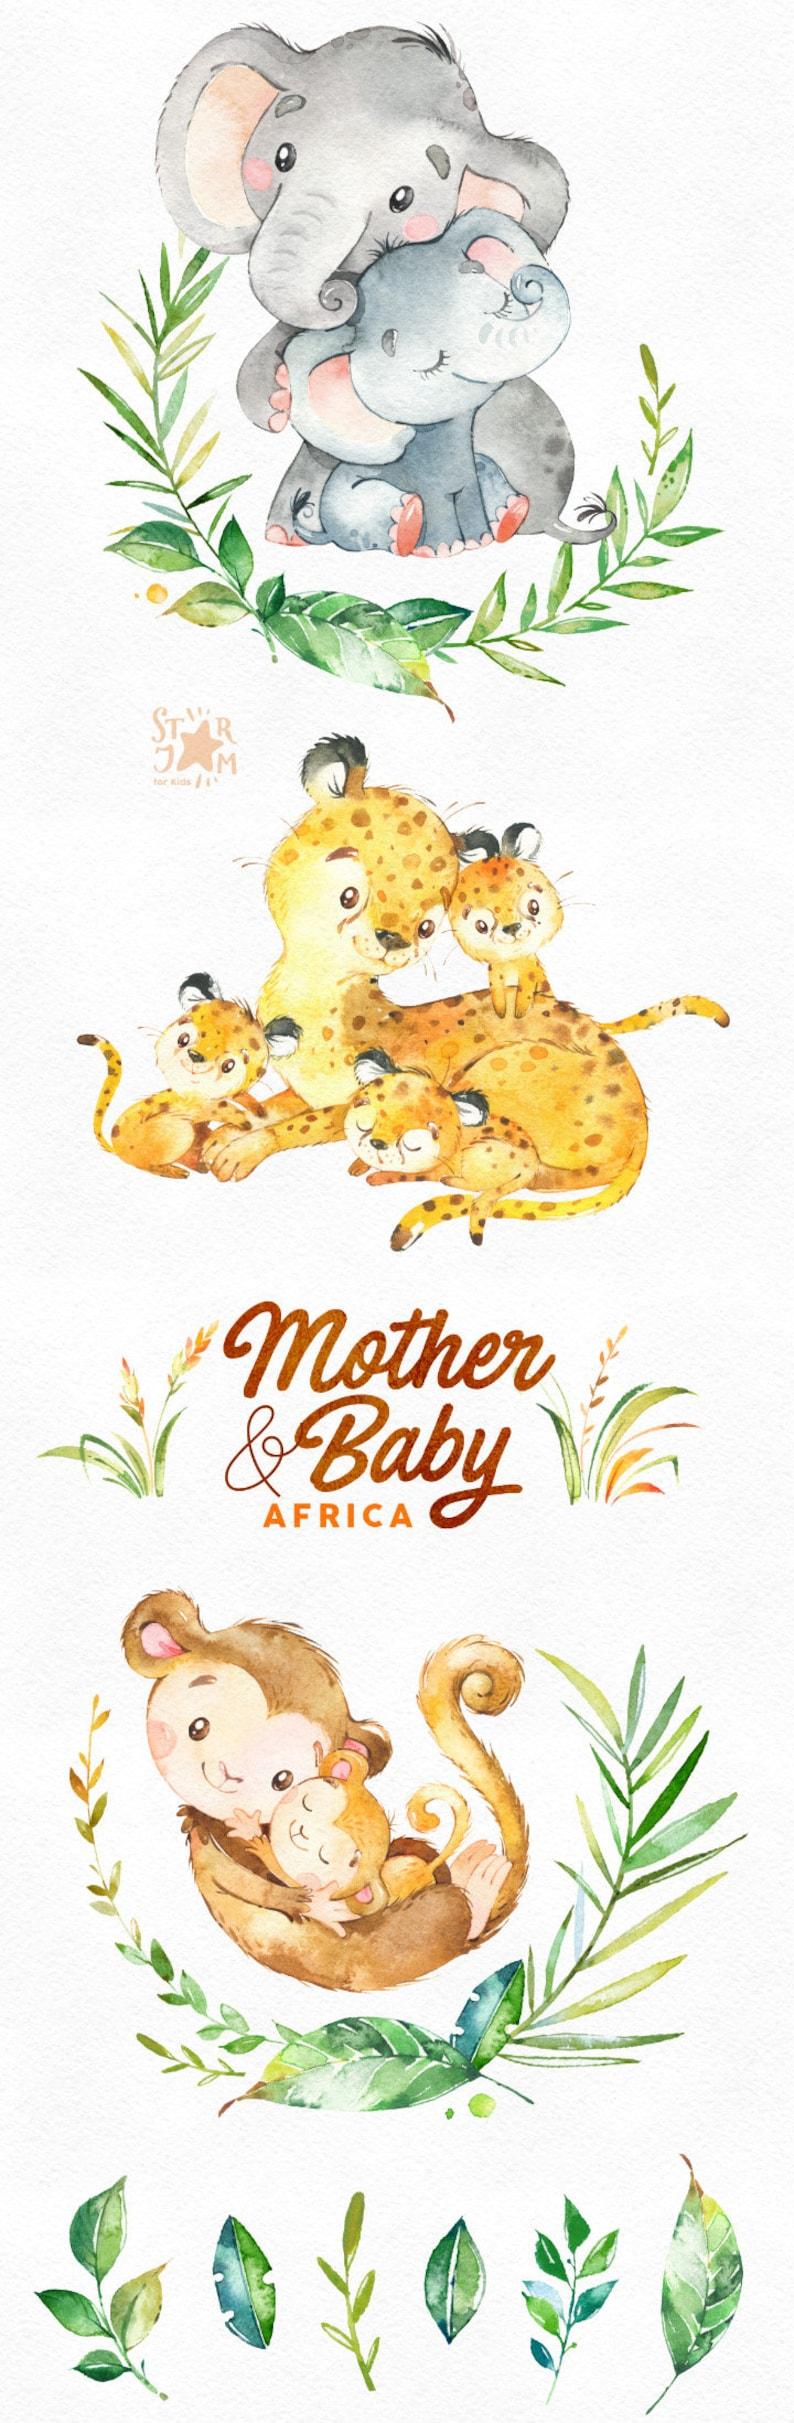 699f24950f247 Madre y bebé. África. Acuarela animales clipart elefante